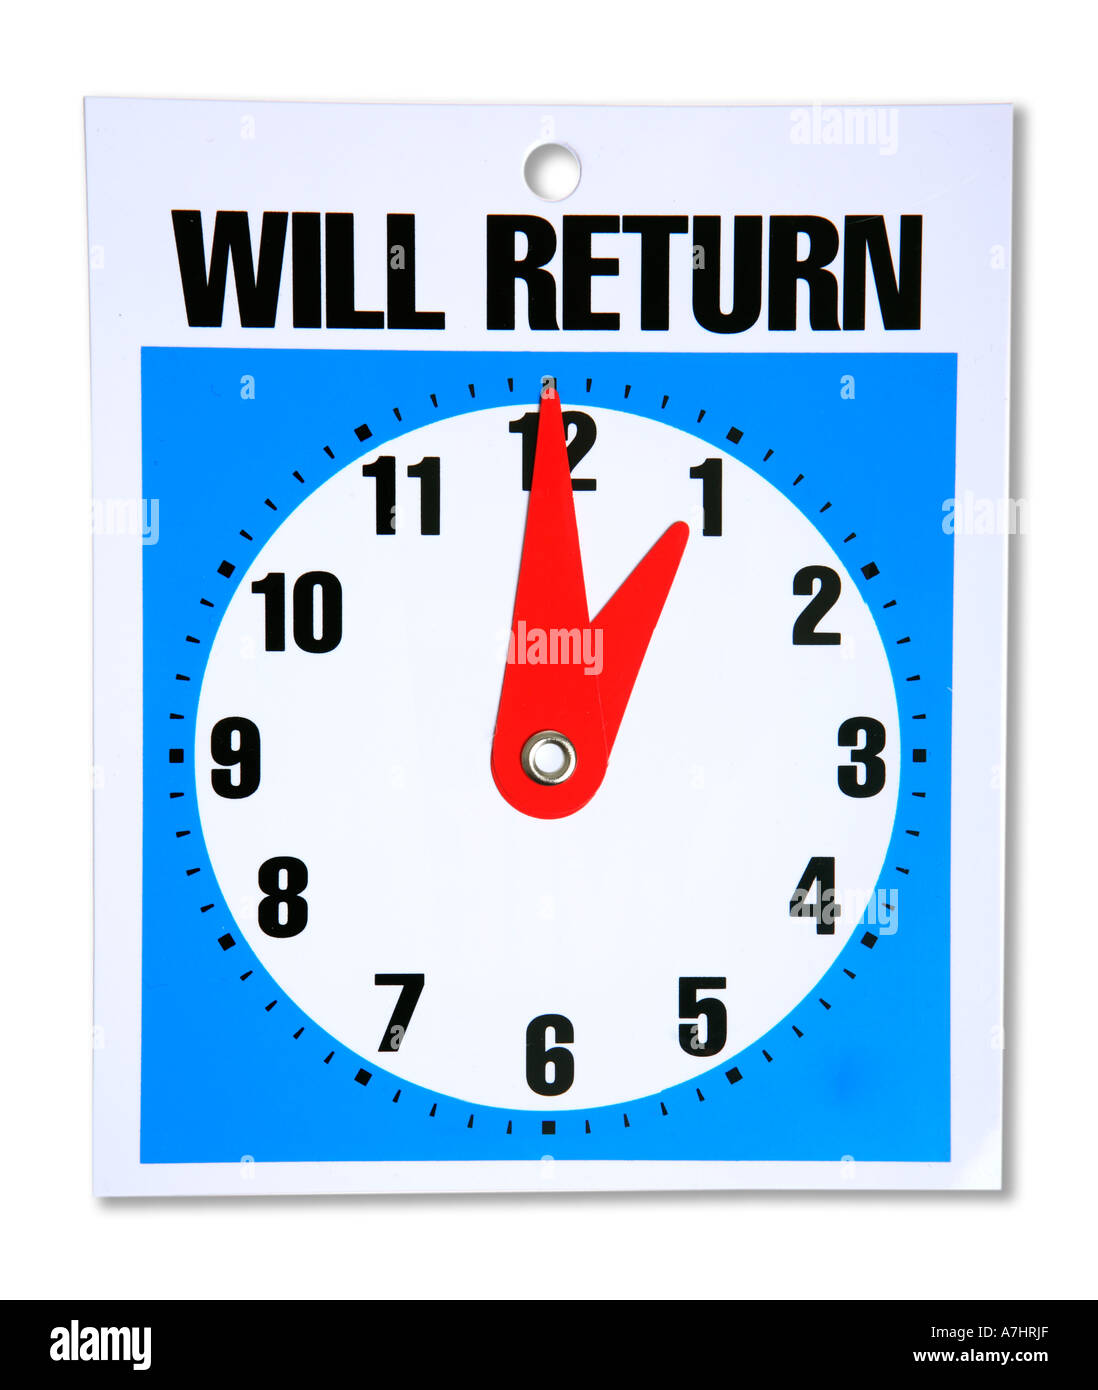 Will return clock - Stock Image